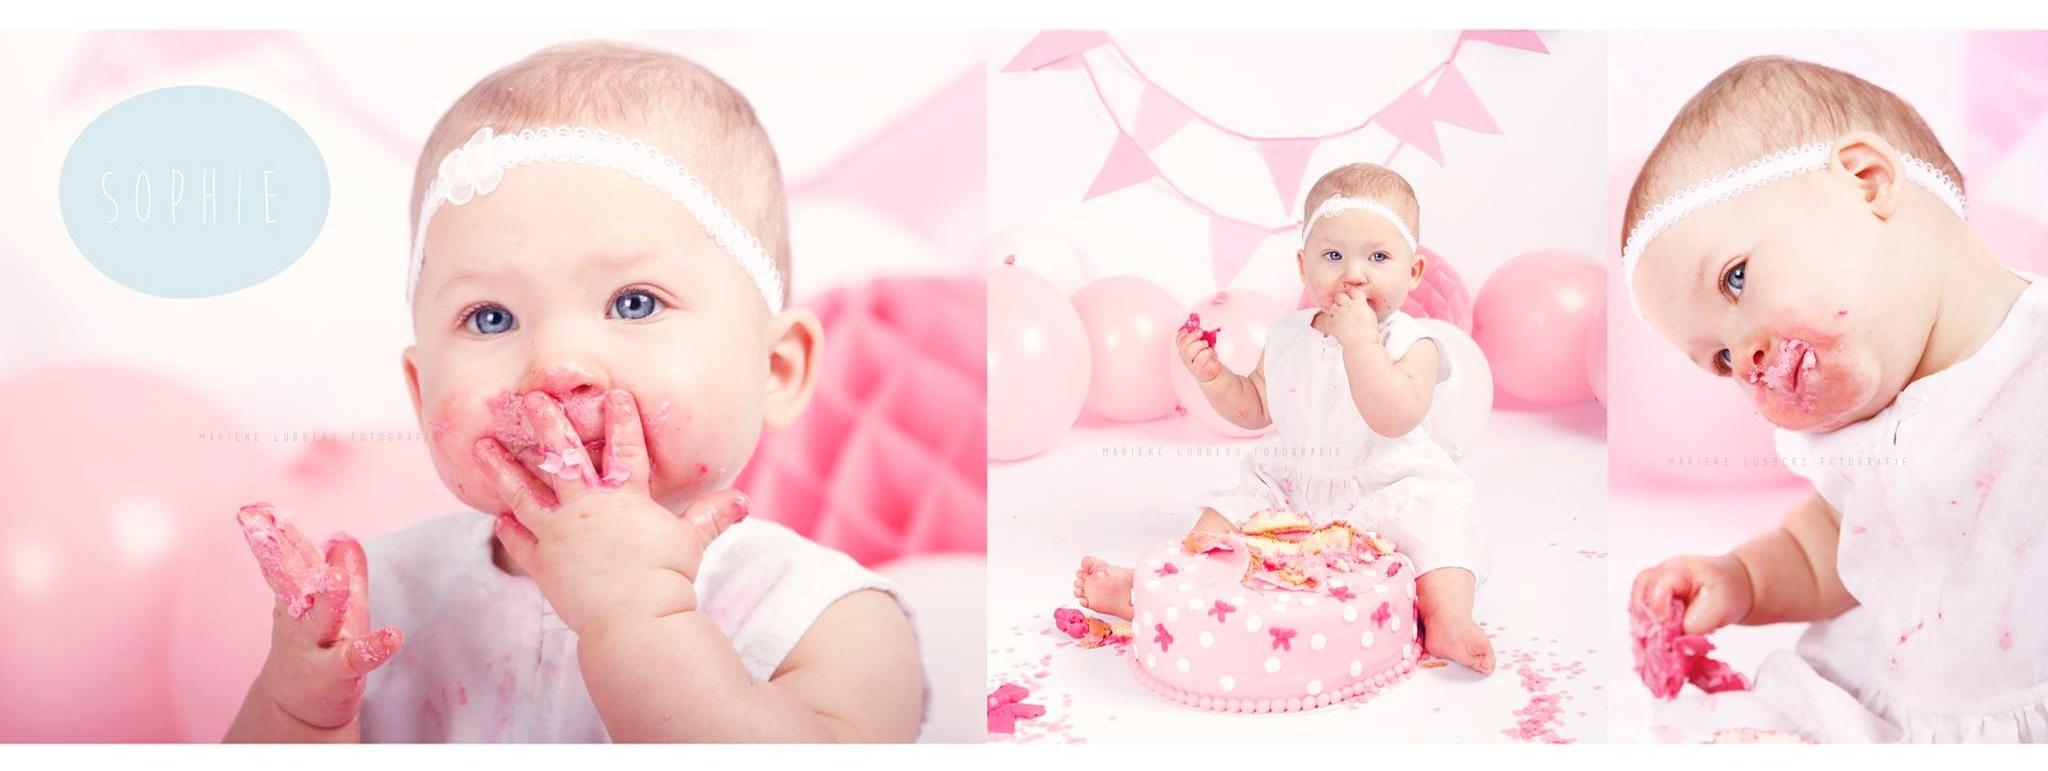 cake-smash-fotoshoot